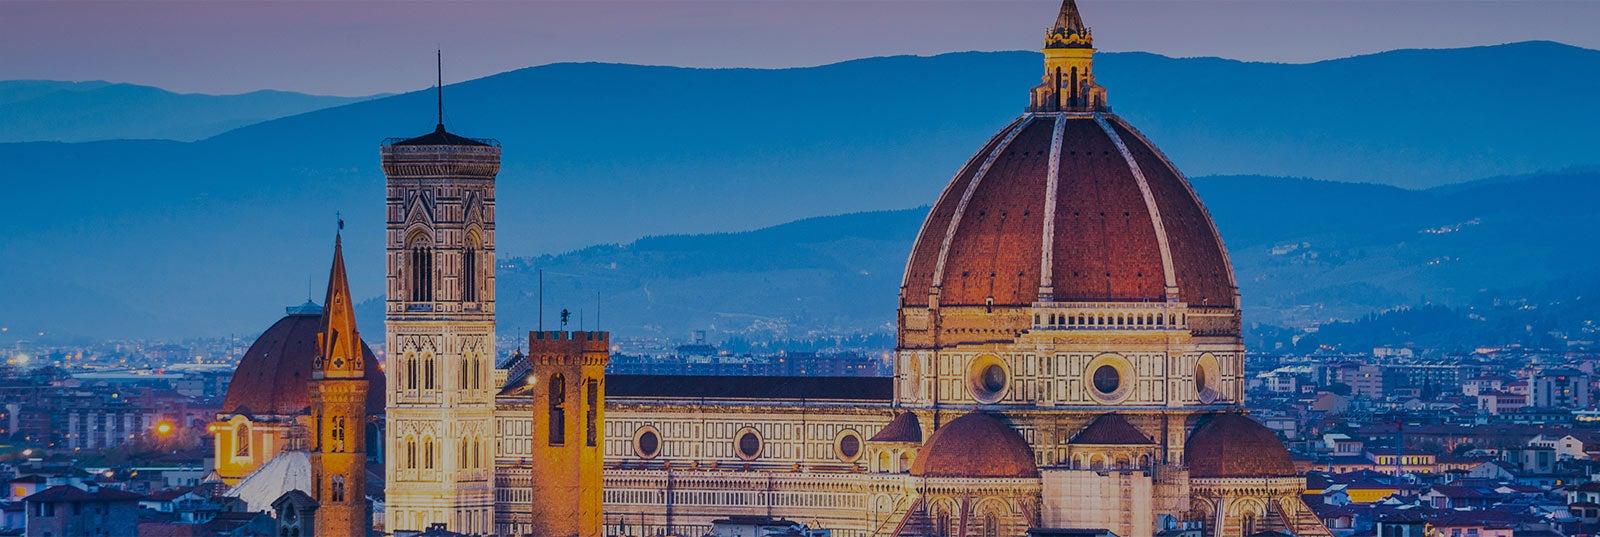 Guía turística de Florença